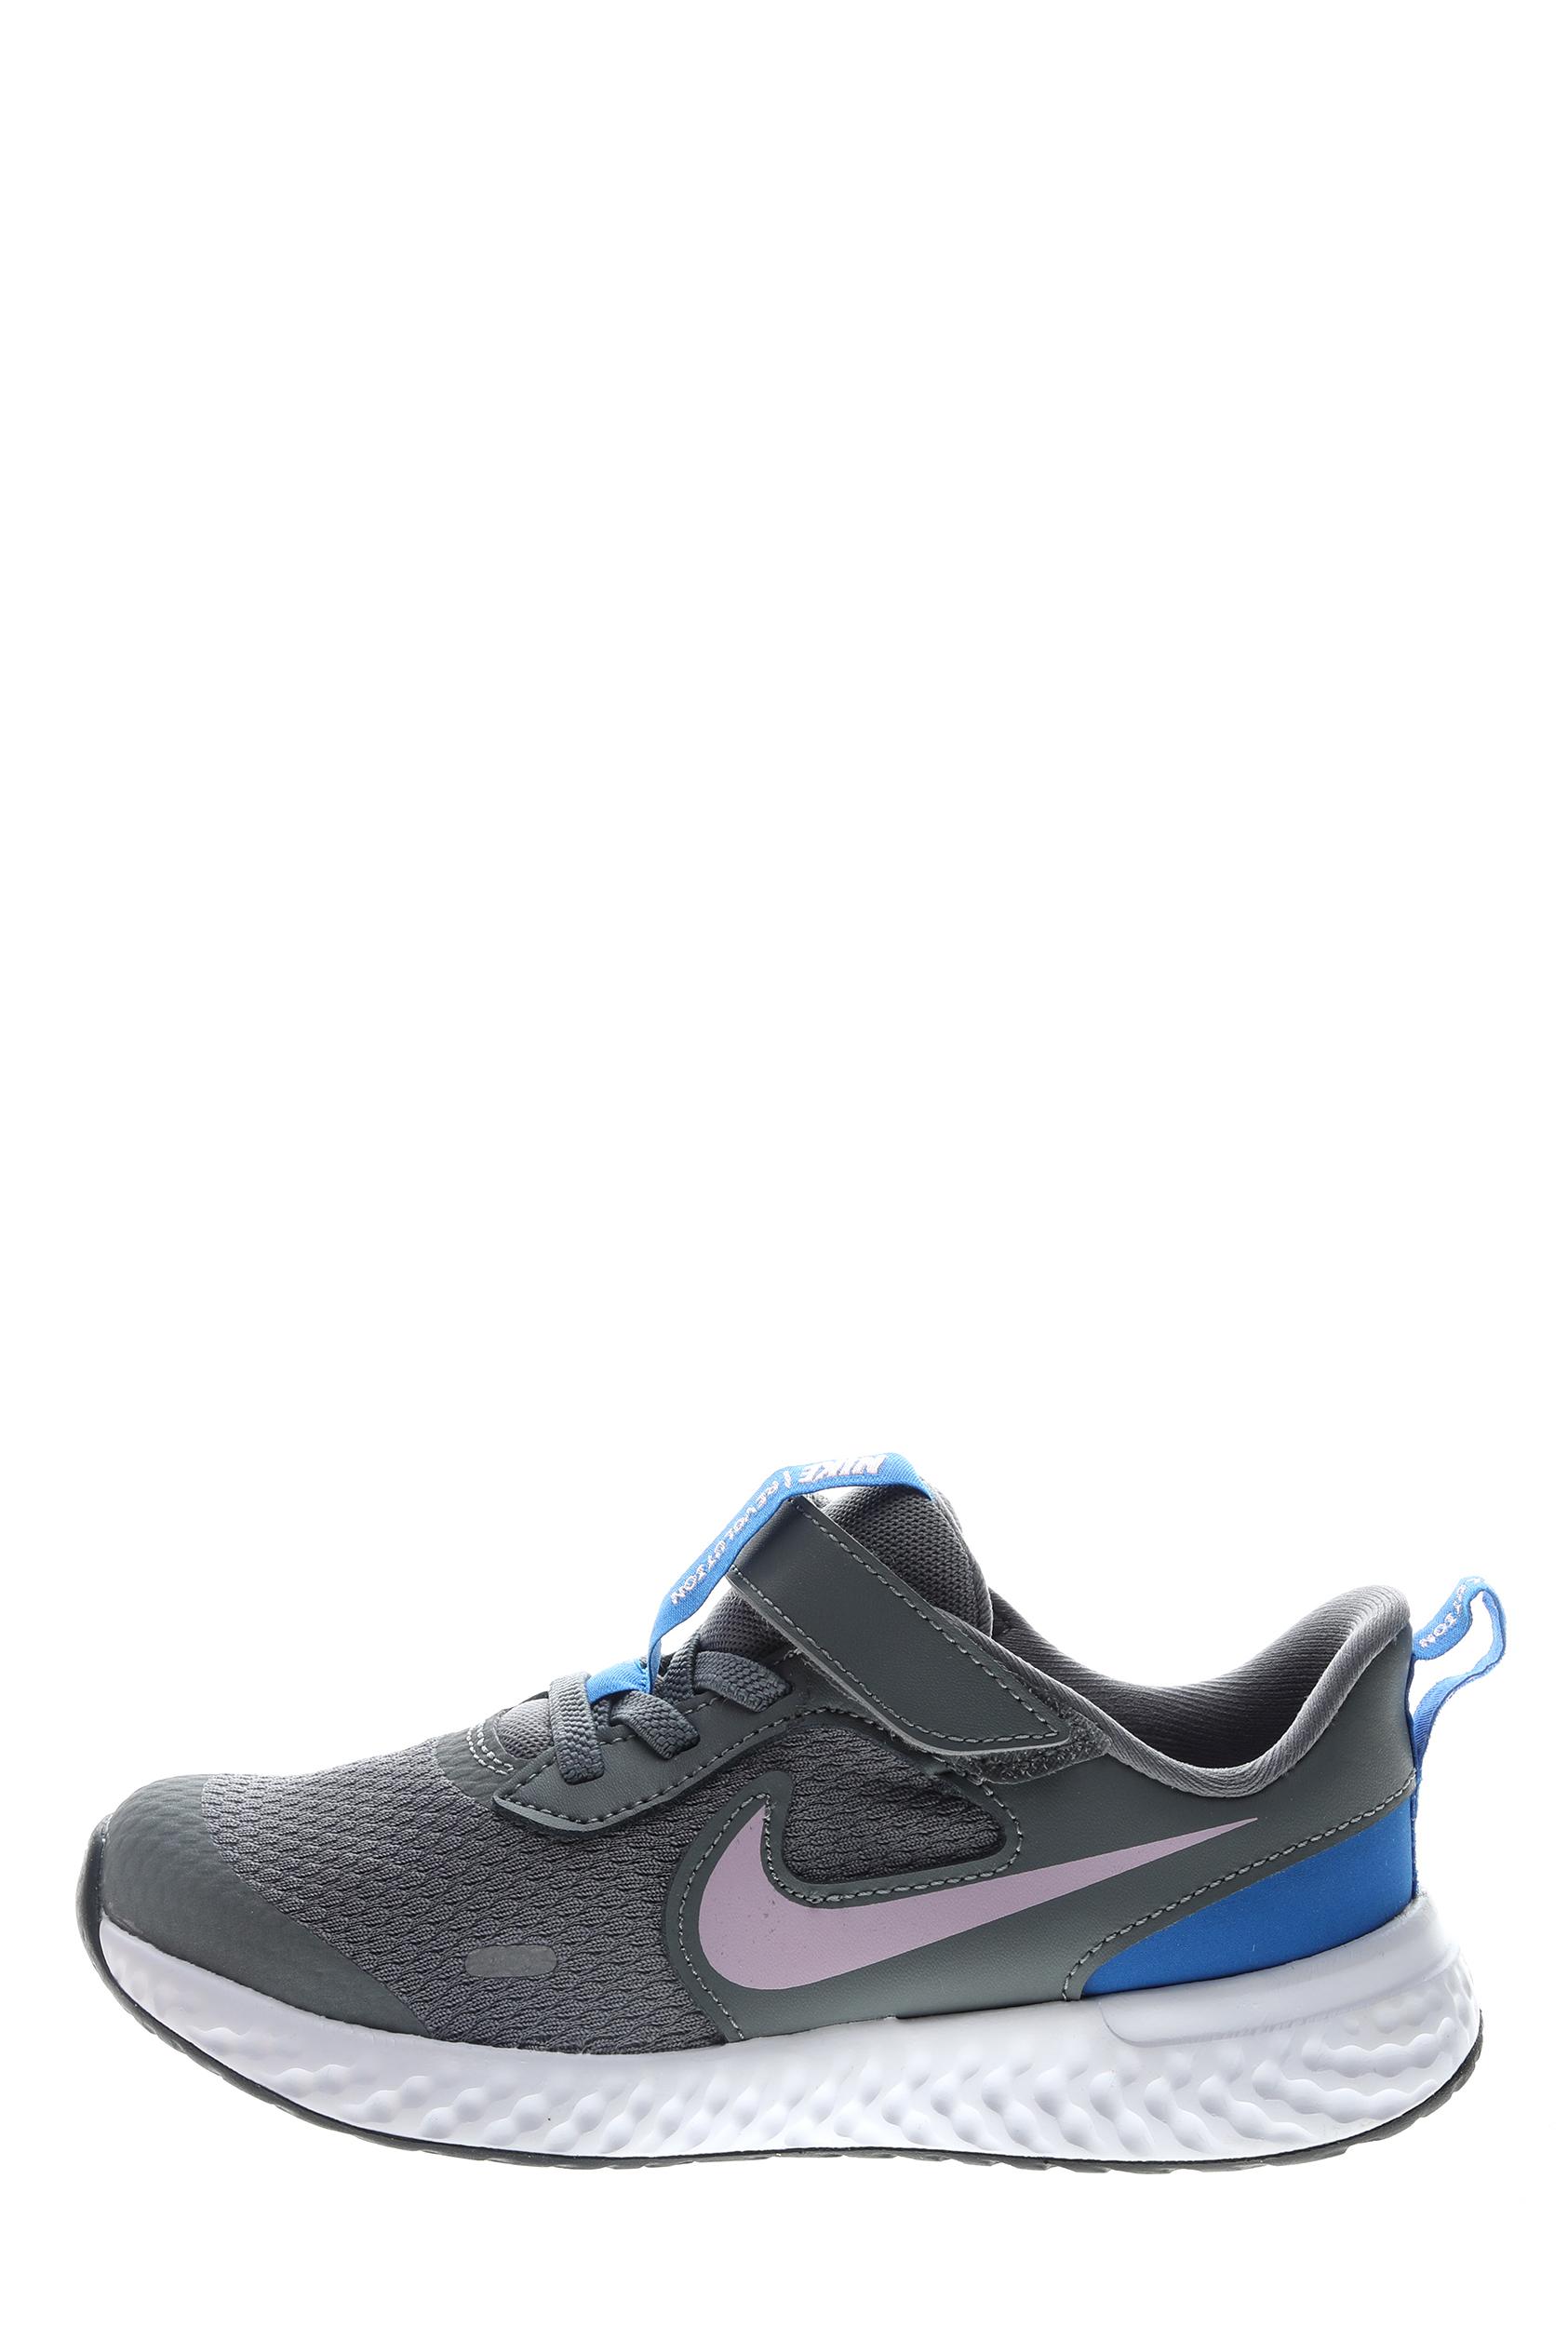 NIKE – Παιδικά παπούτσια running NIKE REVOLUTION 5 γκρι